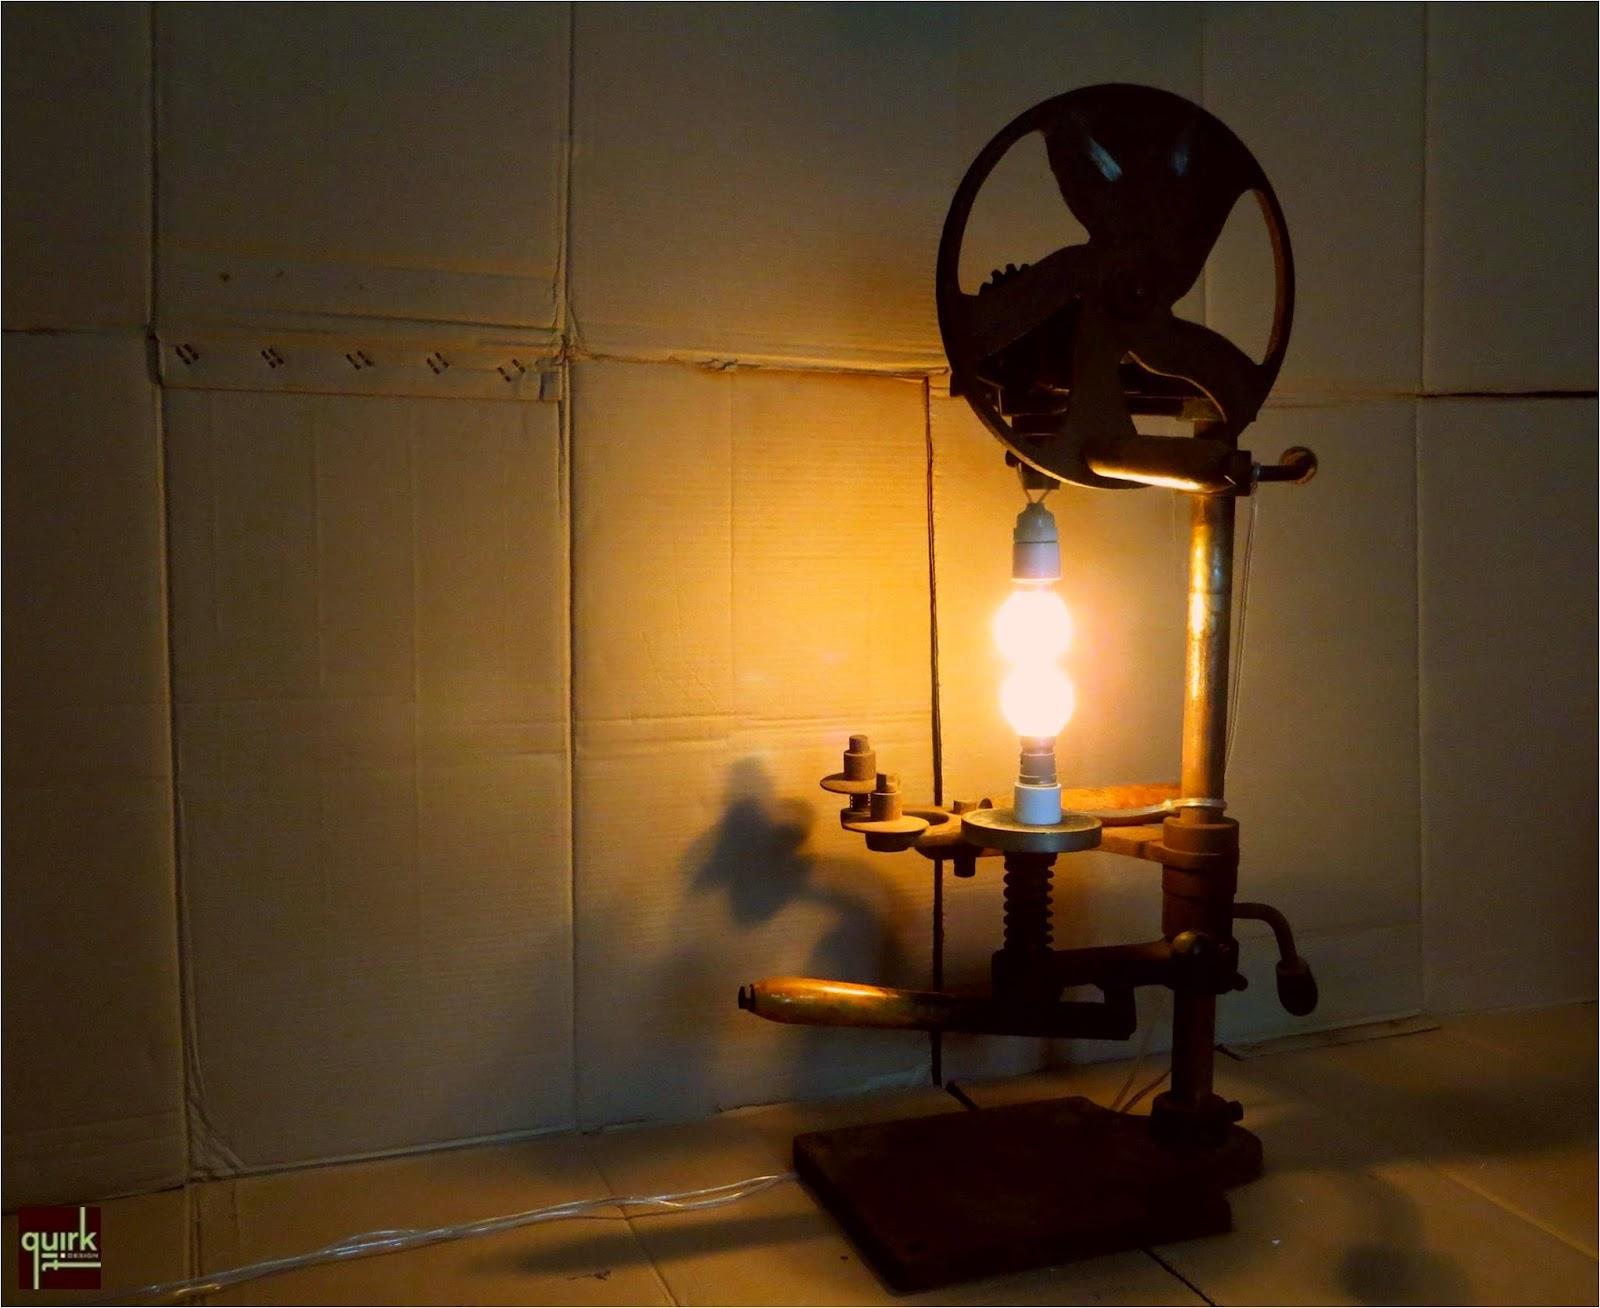 Quirk It Design_Industrial Illumination Lamp_DIY_Quirky_Home_Decor